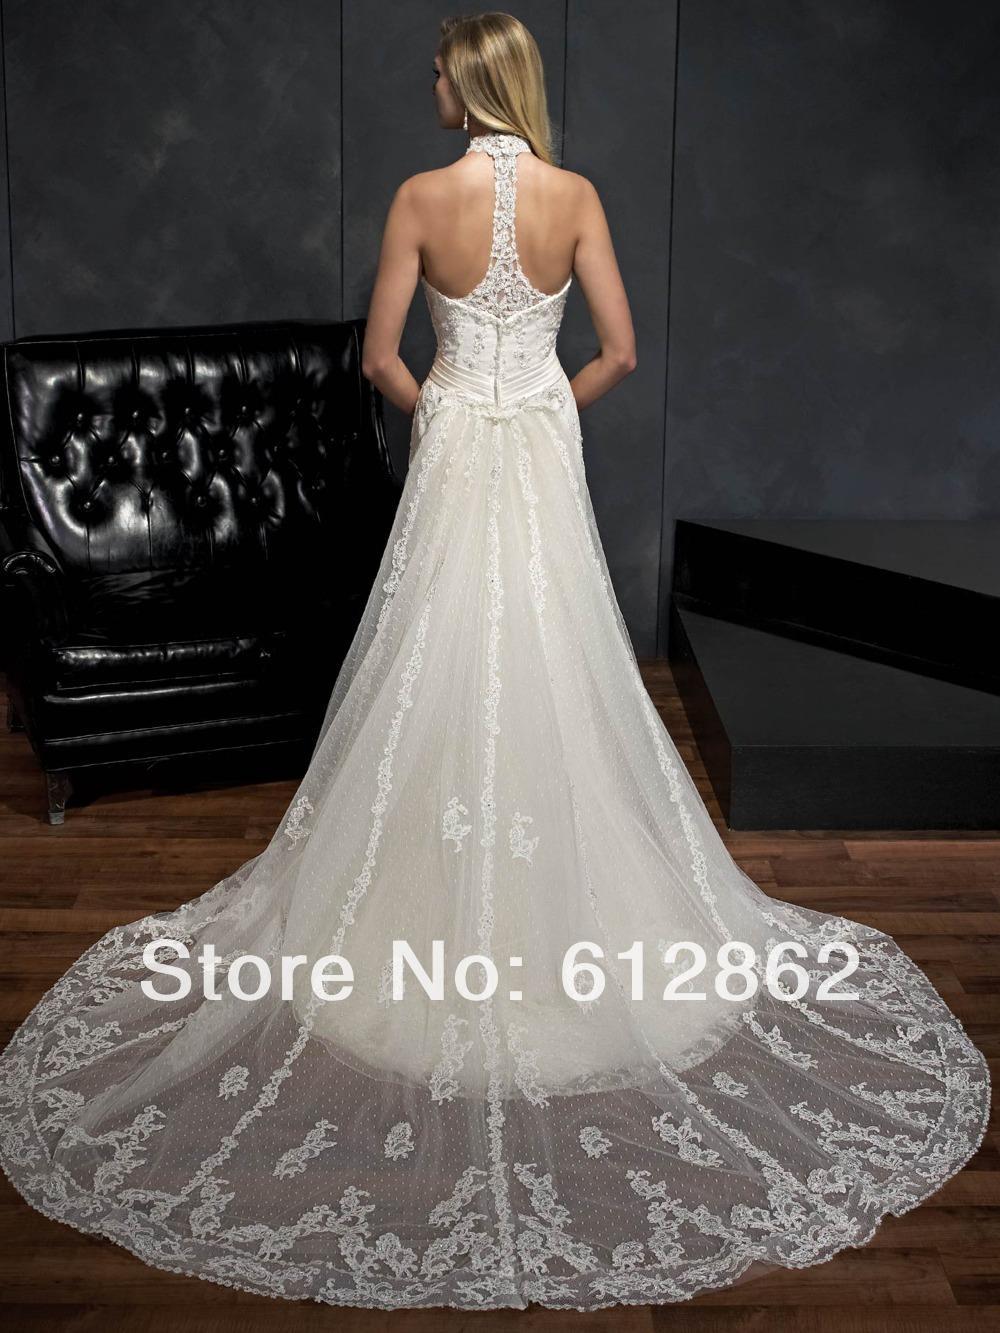 Sleeveless Vestido De Casamento Lace Long Train Low Back Halter Top Wedding  Dress-in Wedding Dresses from Weddings   Events on Aliexpress.com  74ca62f5d52b